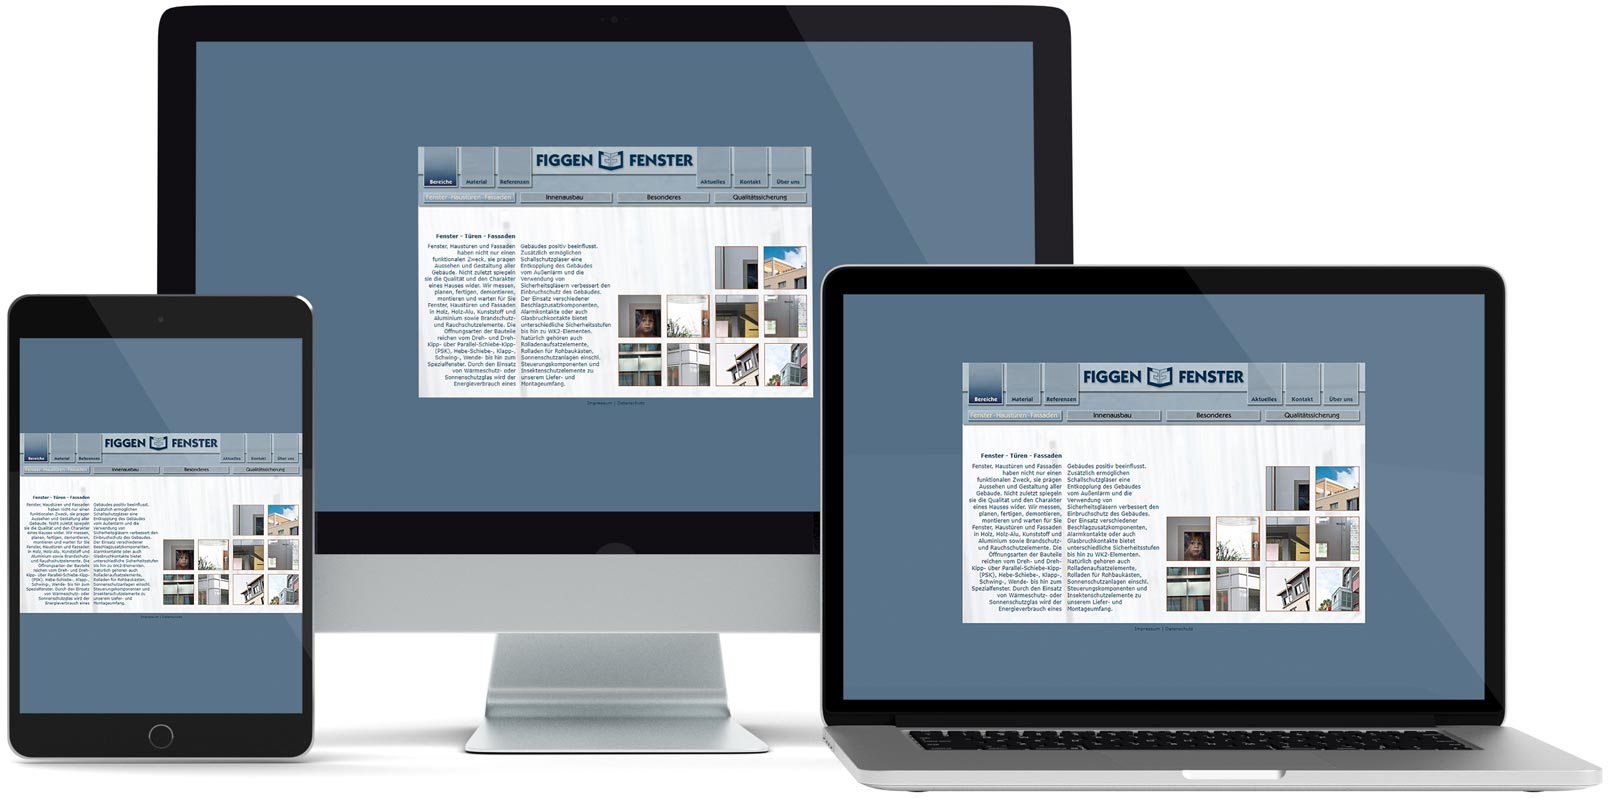 Dreamweaver & WordPress Webdesign: Figgen-Fenster